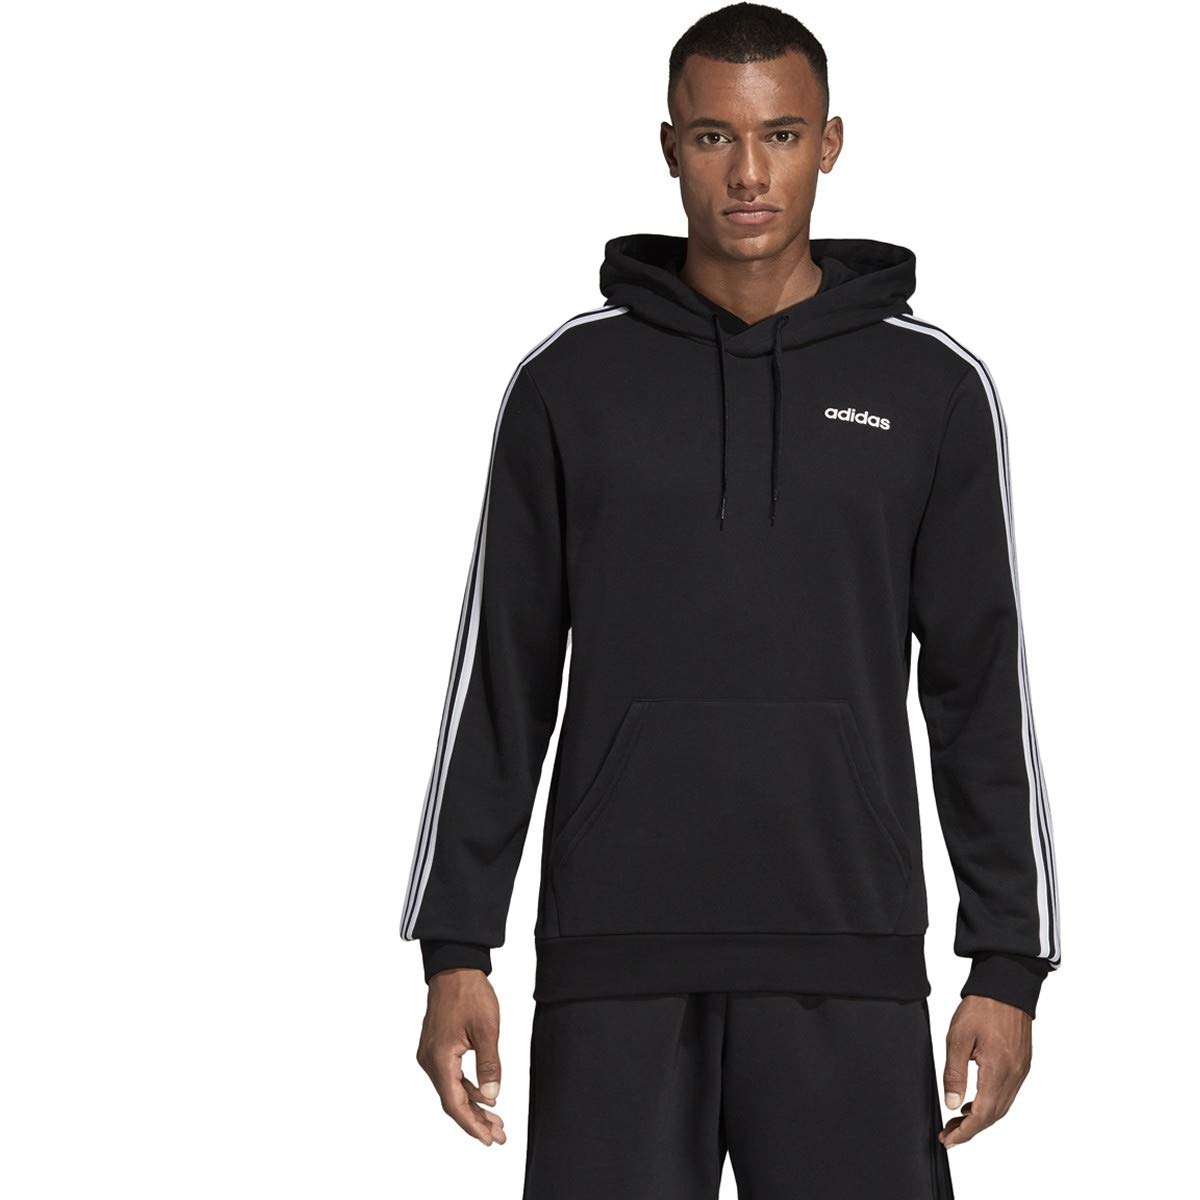 adidas Essentials Men's 3-Stripes Hoodie, Black/White, 4X-Large by adidas